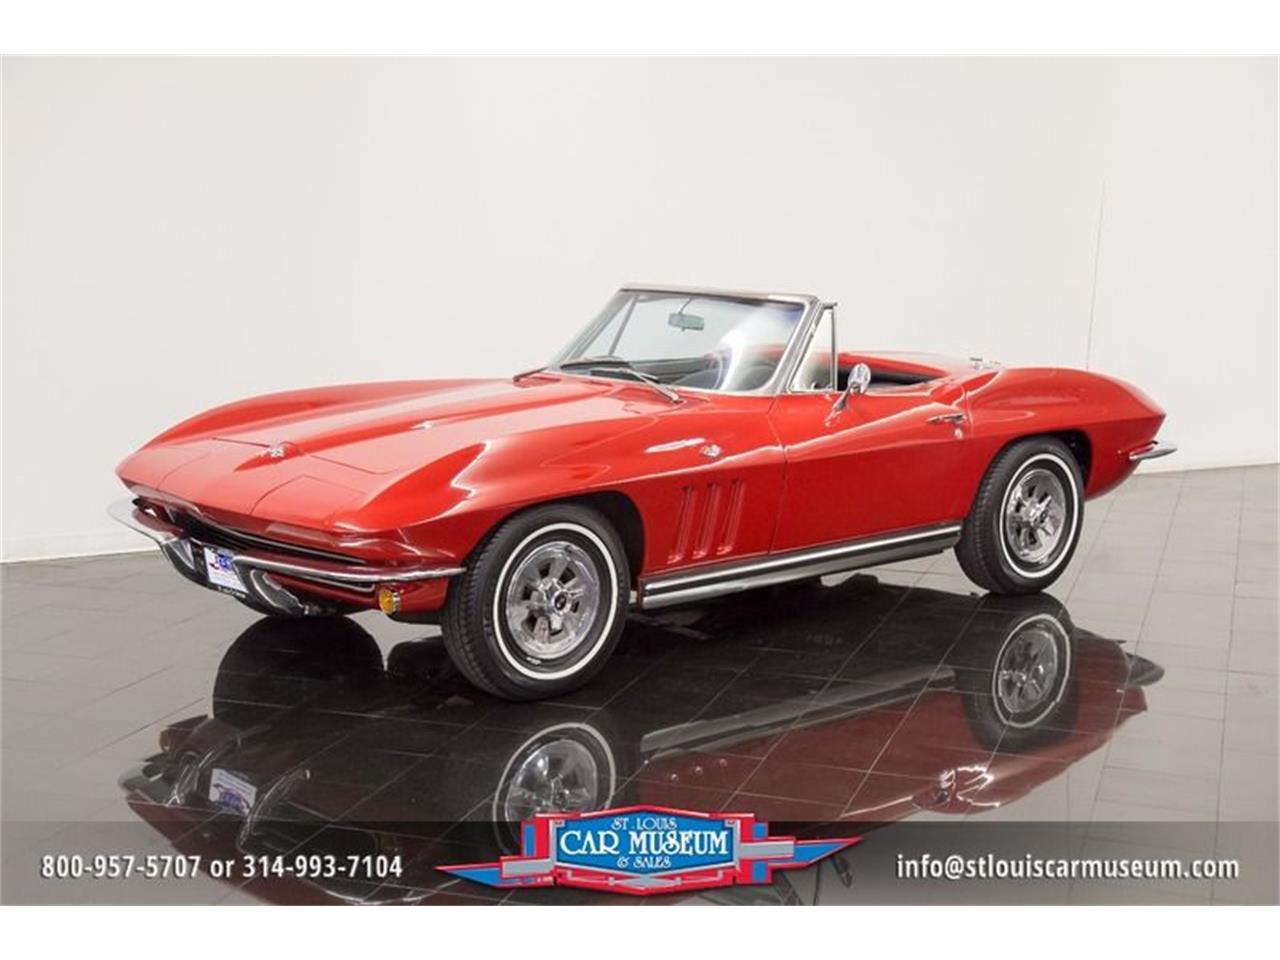 Kelebihan Corvette 65 Top Model Tahun Ini